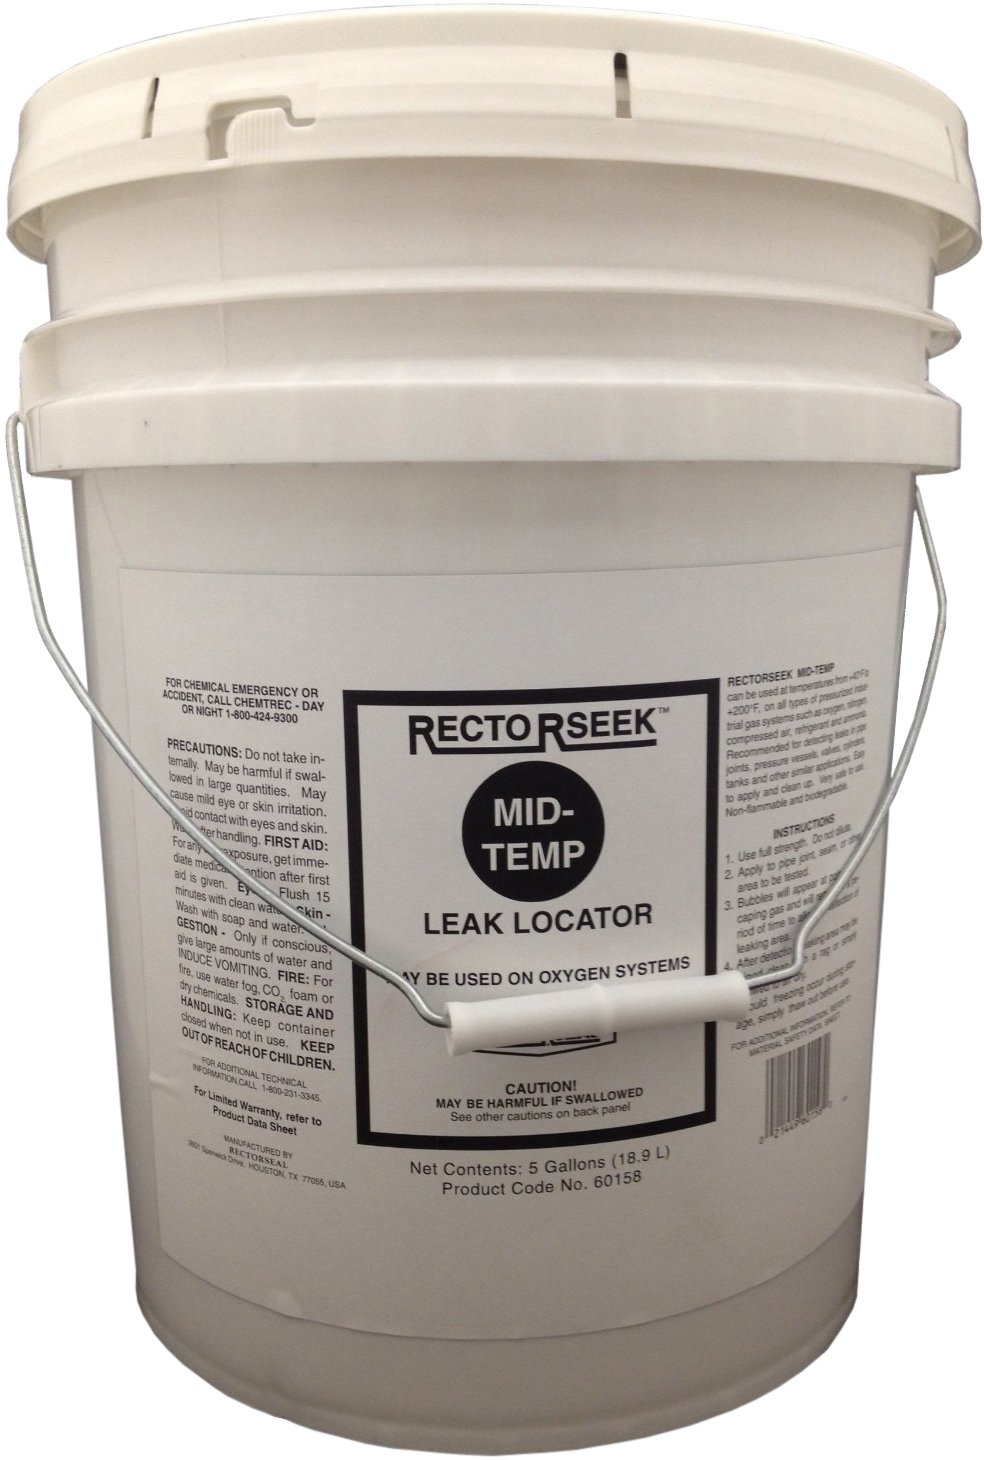 Rectorseal 60158 5-Gallon Pail Rectorseek Mid-Temp Leak Locator The Rectorseal Corporation